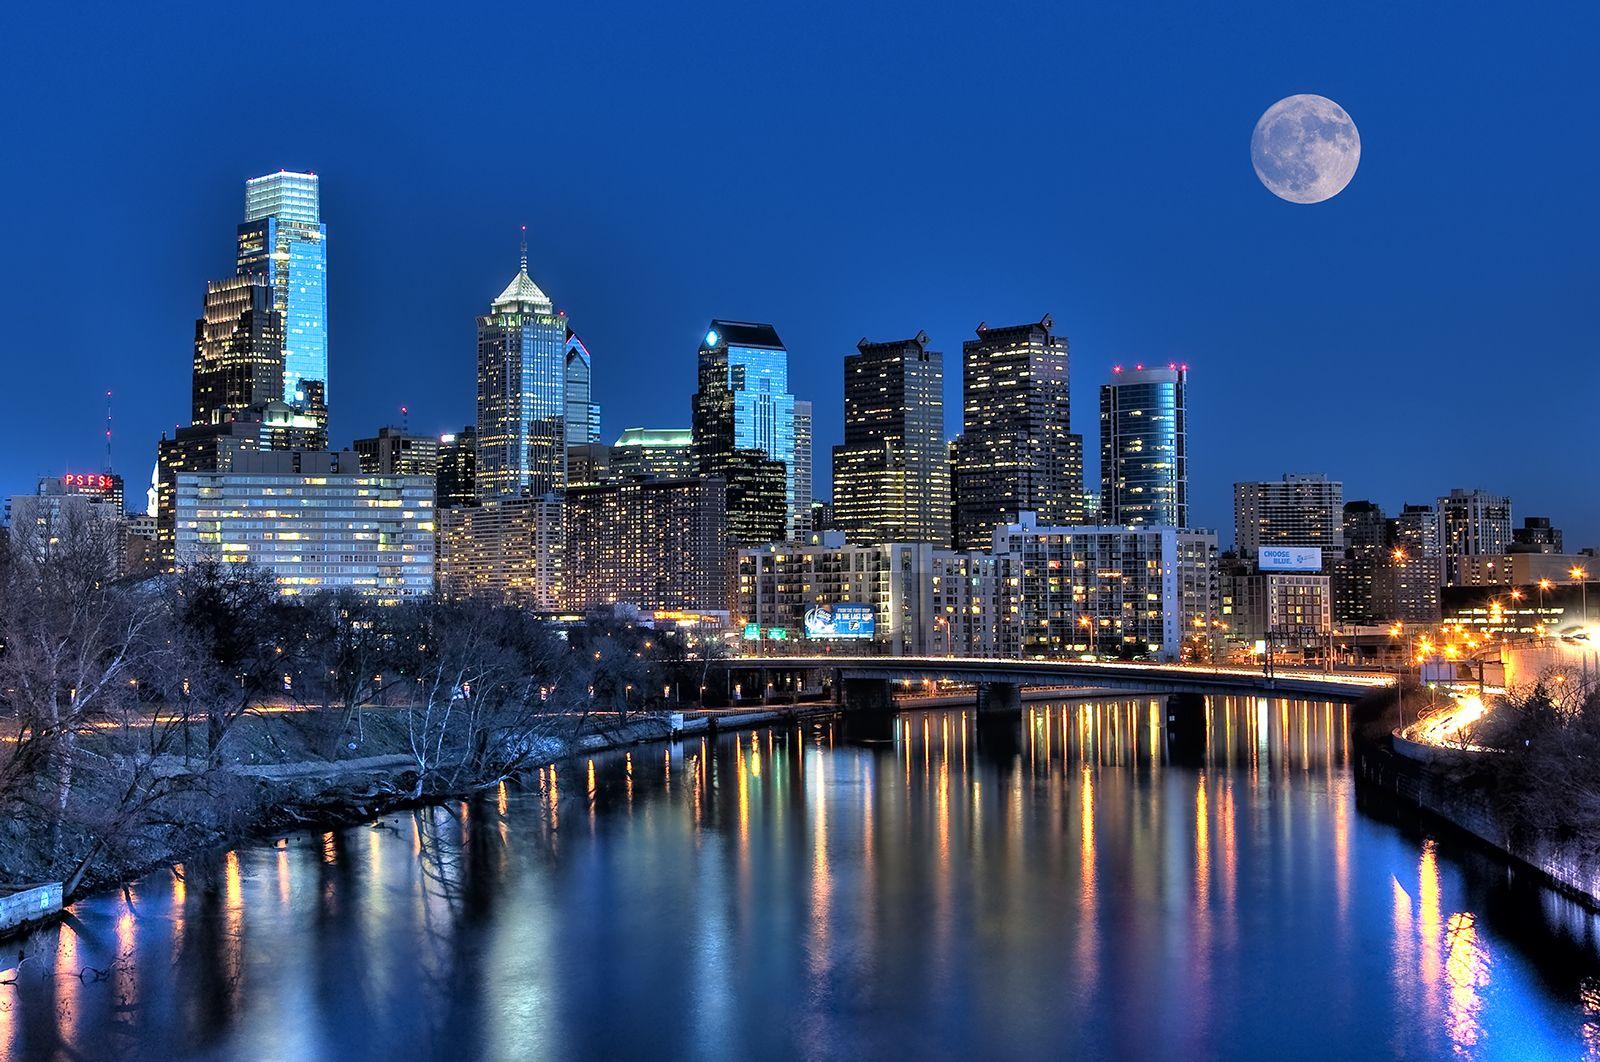 Philadelphia Skyline at Night.jpg